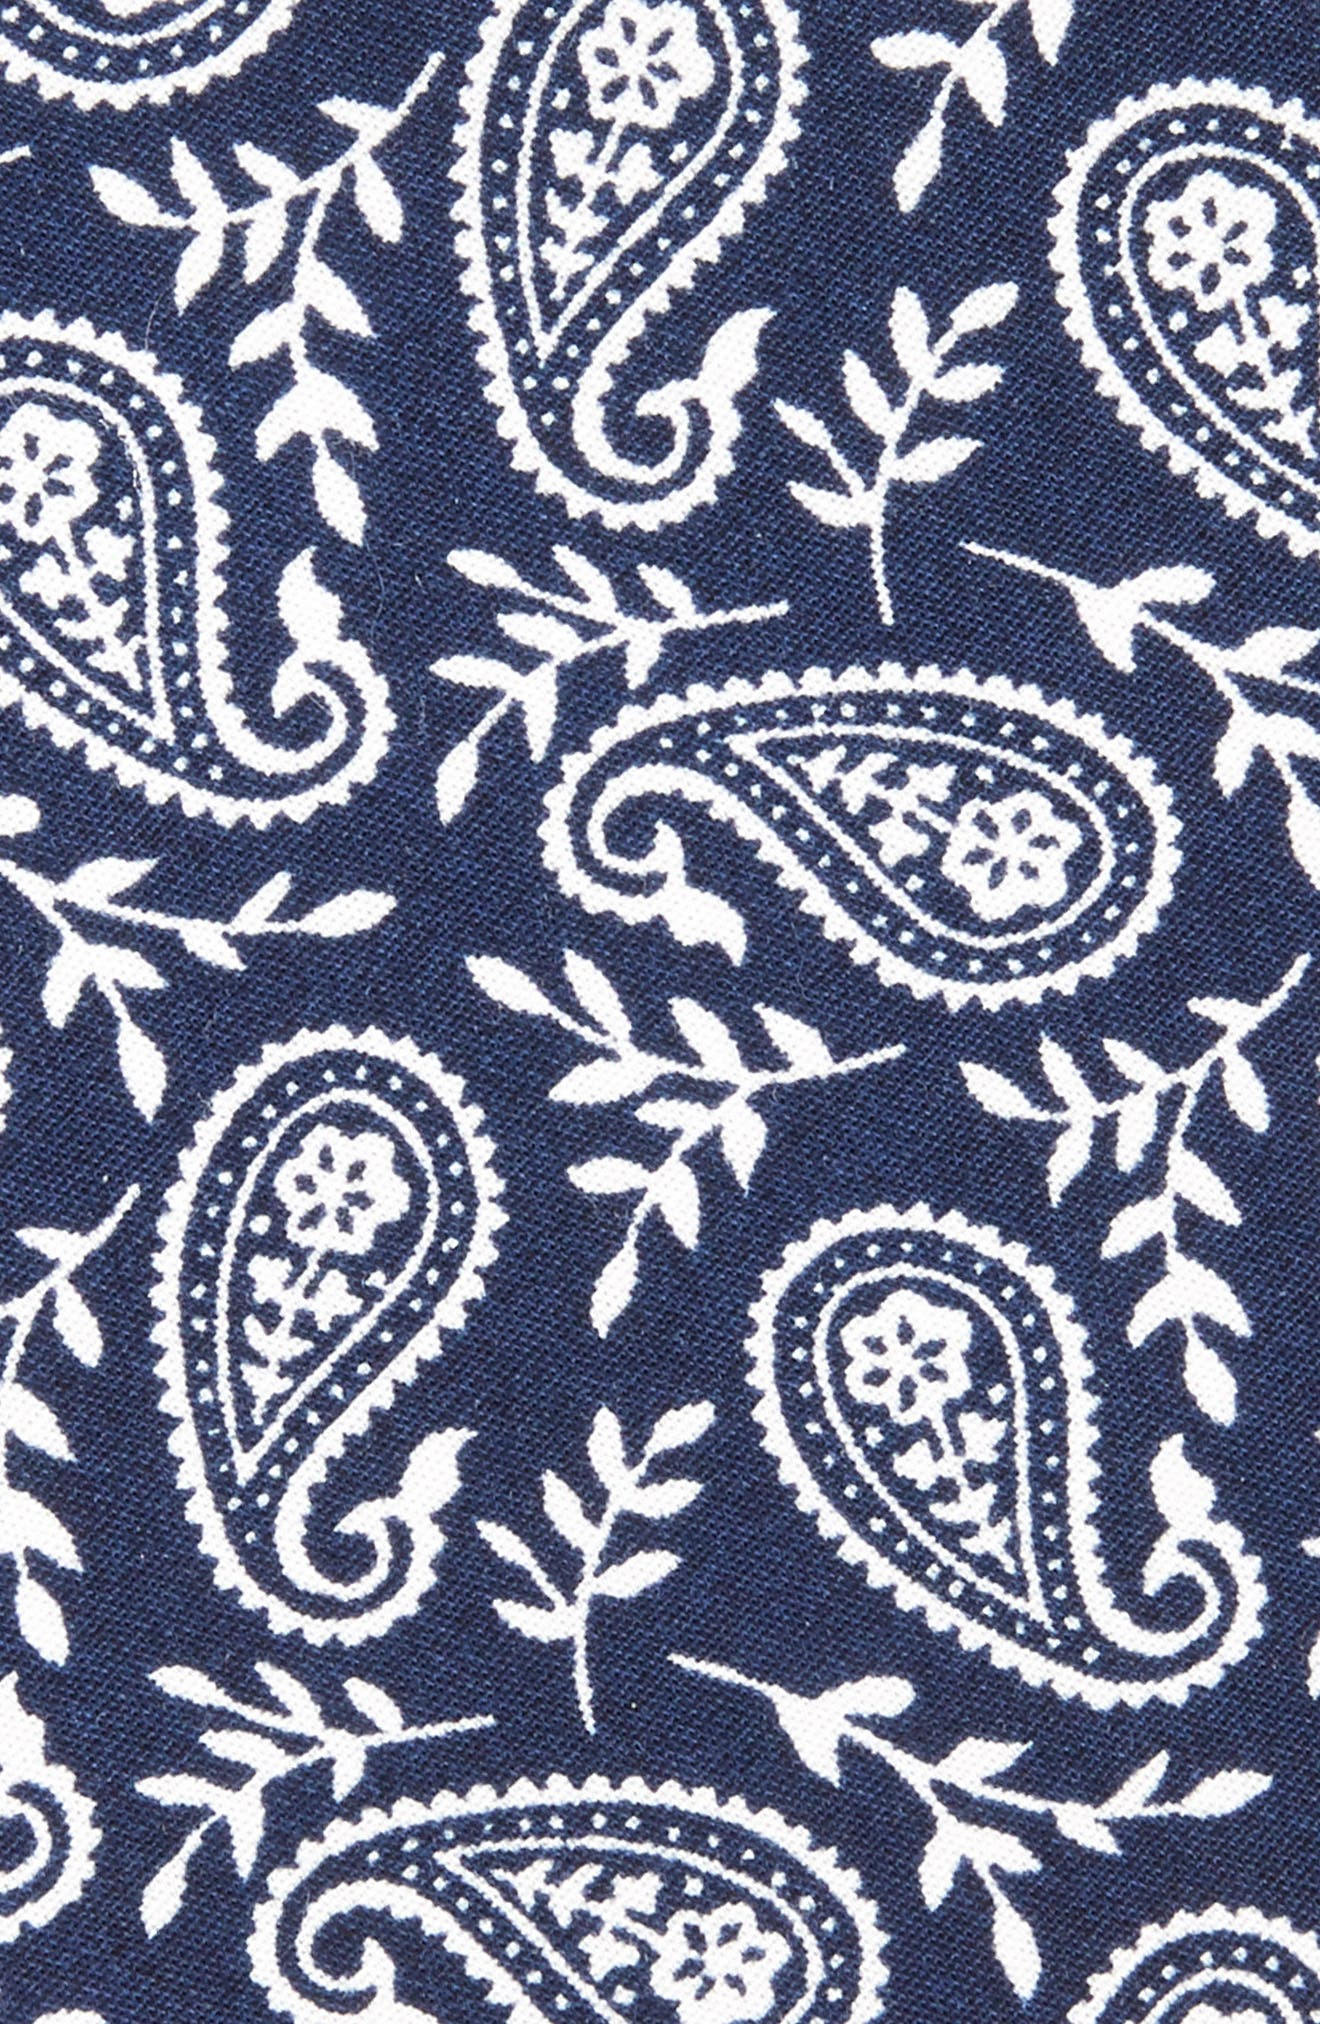 Paisley Cotton Skinny Tie,                             Alternate thumbnail 2, color,                             Navy